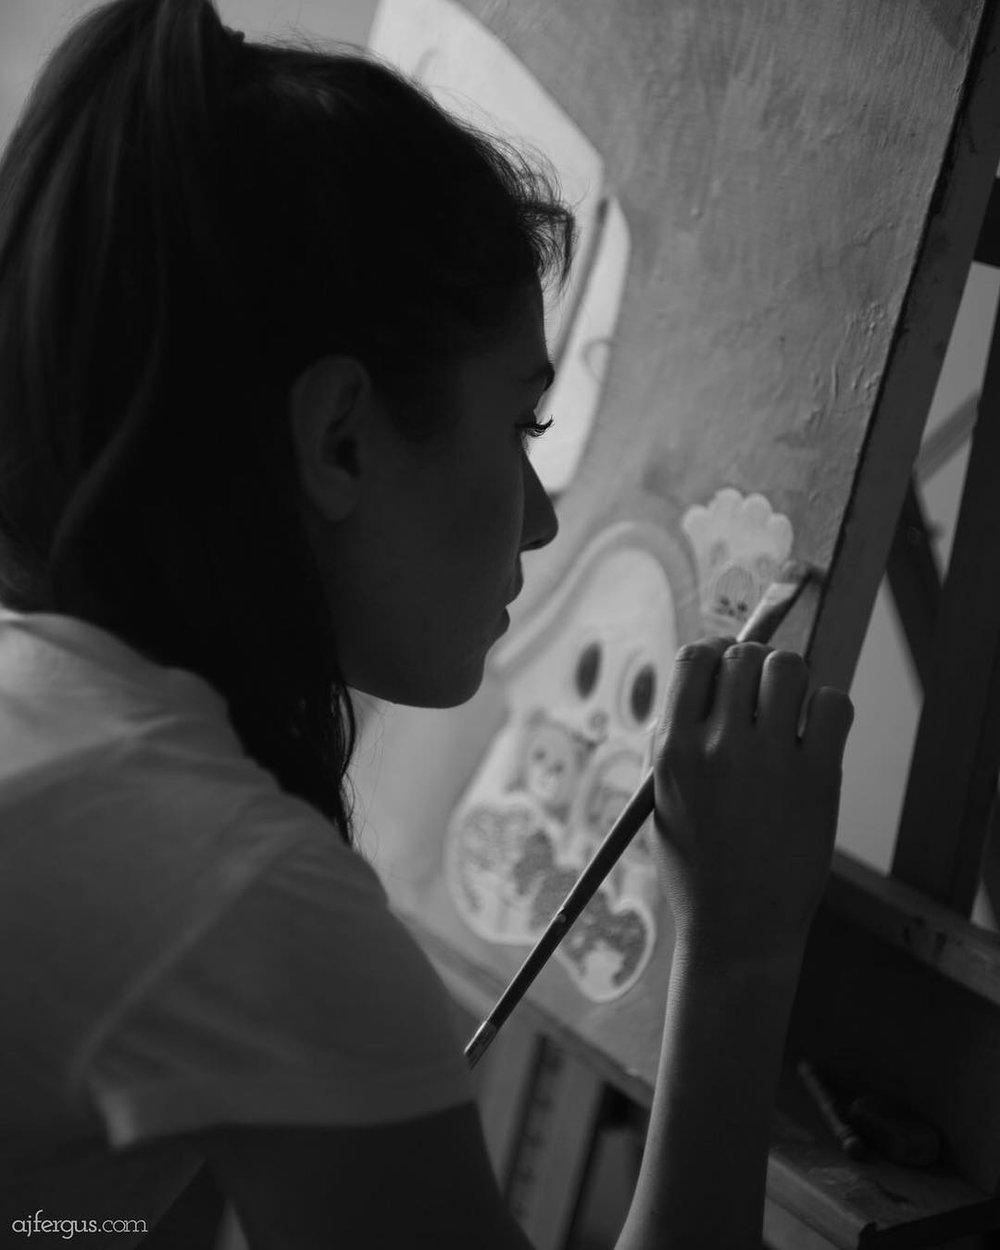 katrina-eugenia-painting-live-painting-live-art-live-artist-nyc-macys-philosophy-pure-grace-nude-rose-katrina-eugenia-20.jpg